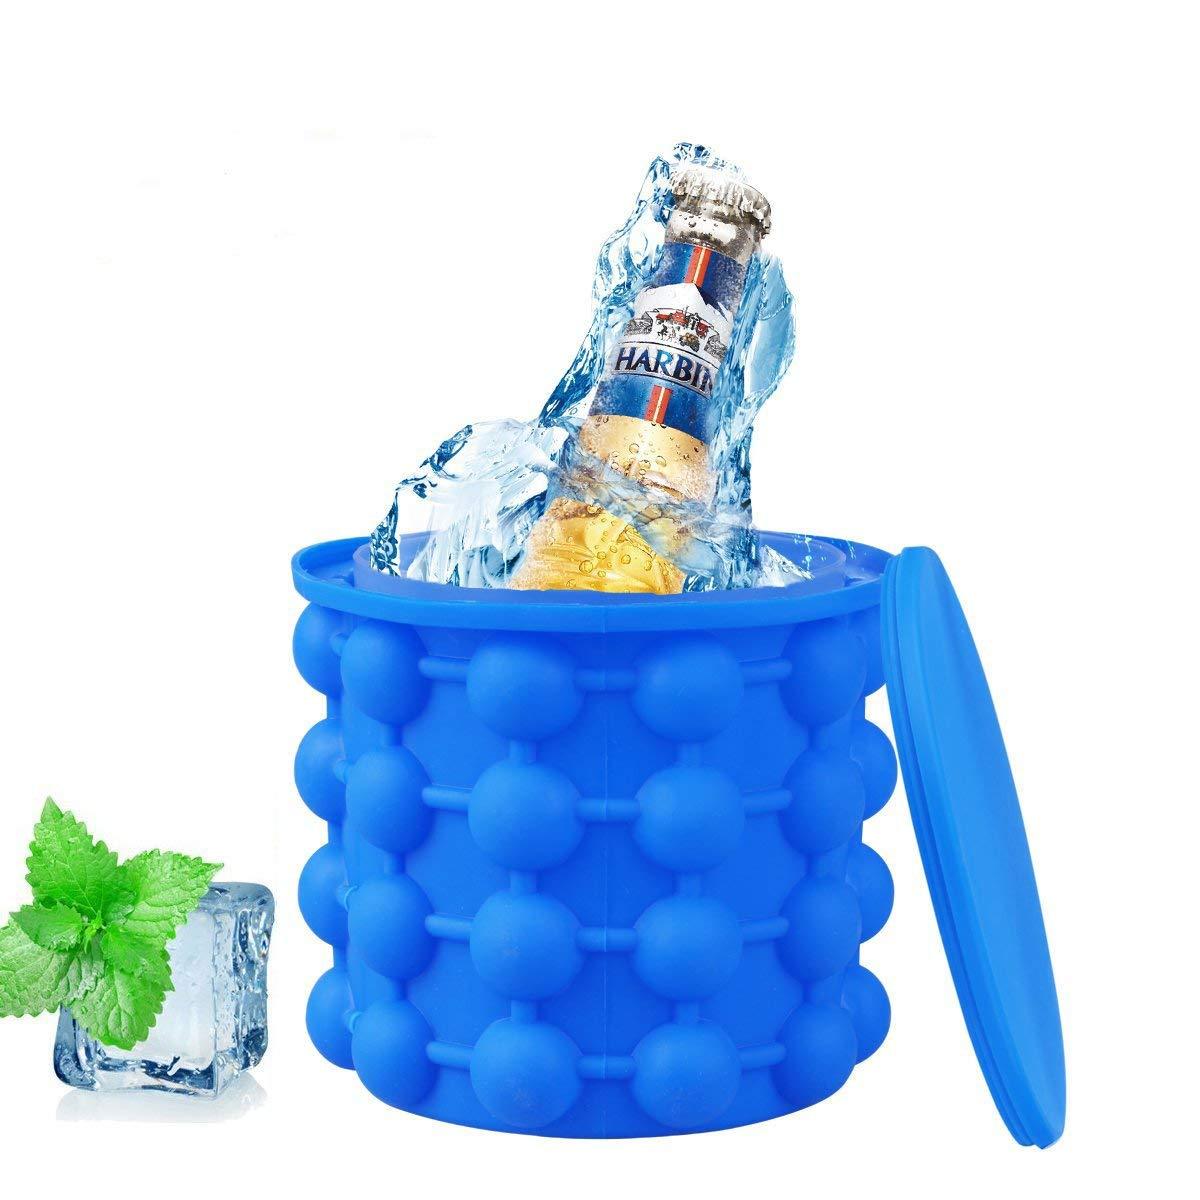 Aitsite Bac à Glaçon Ice Cube Maker Genie Irlde Ice Genie Silicone Moules Seau à Glace Ice Cube Navire